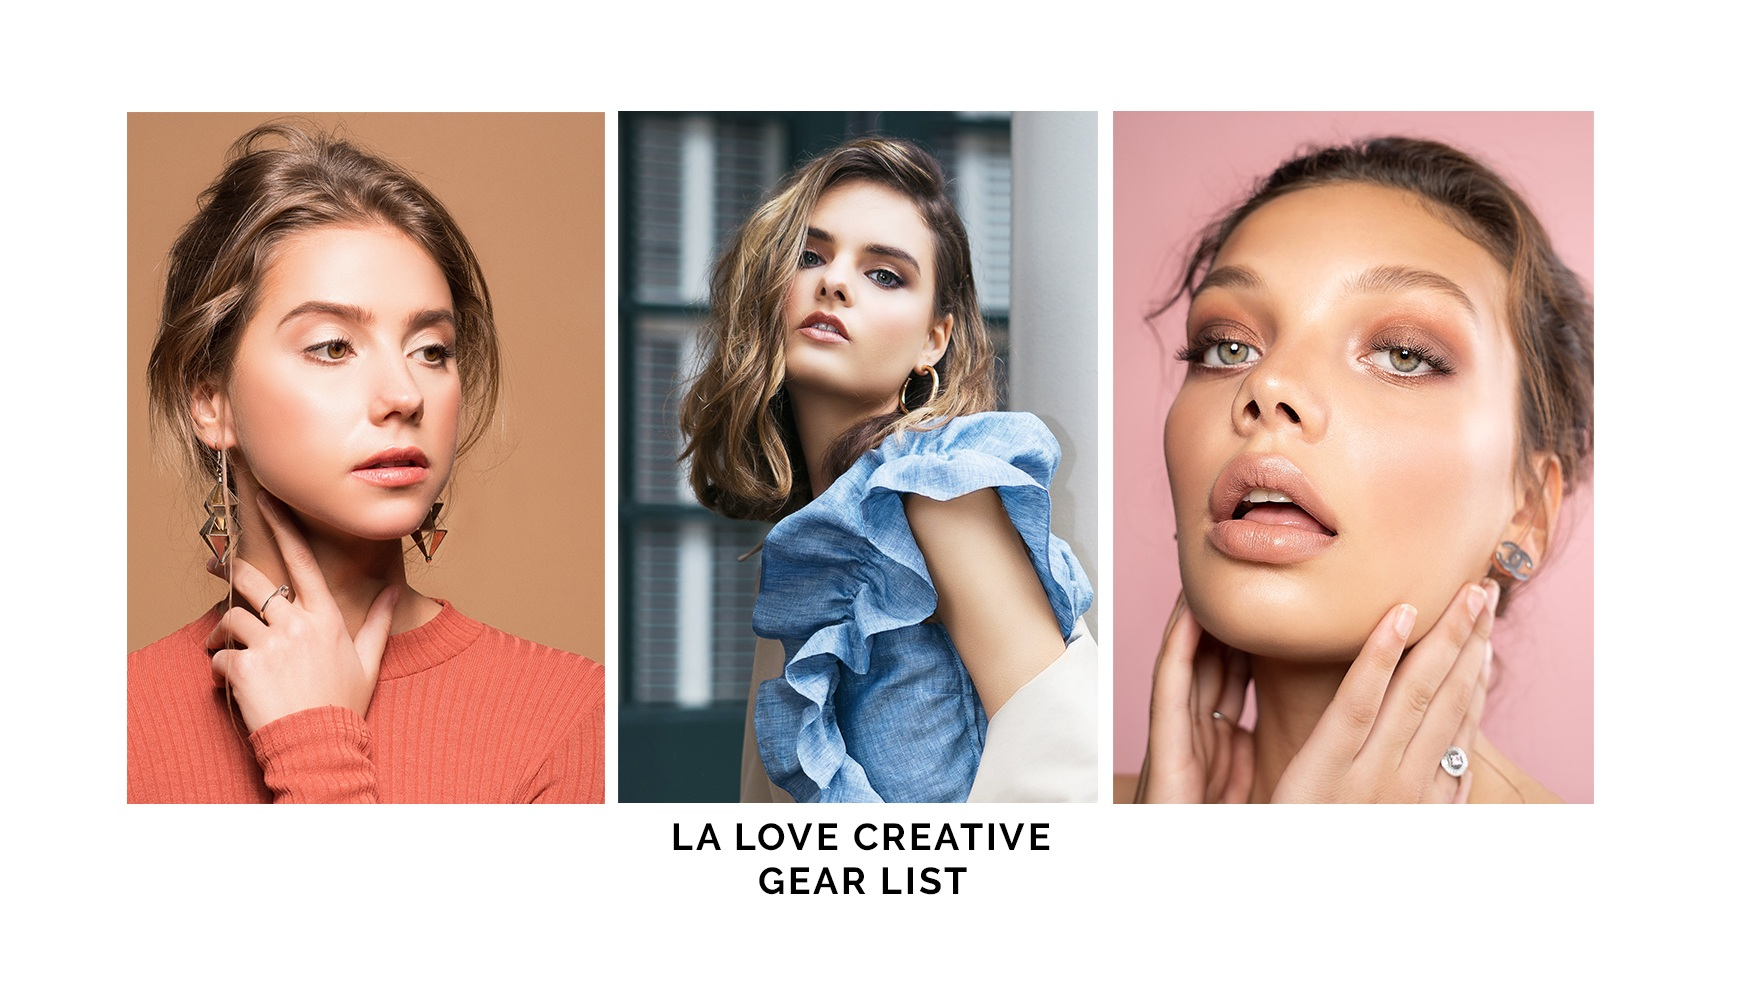 LA Love Creative Equipment and Gear List